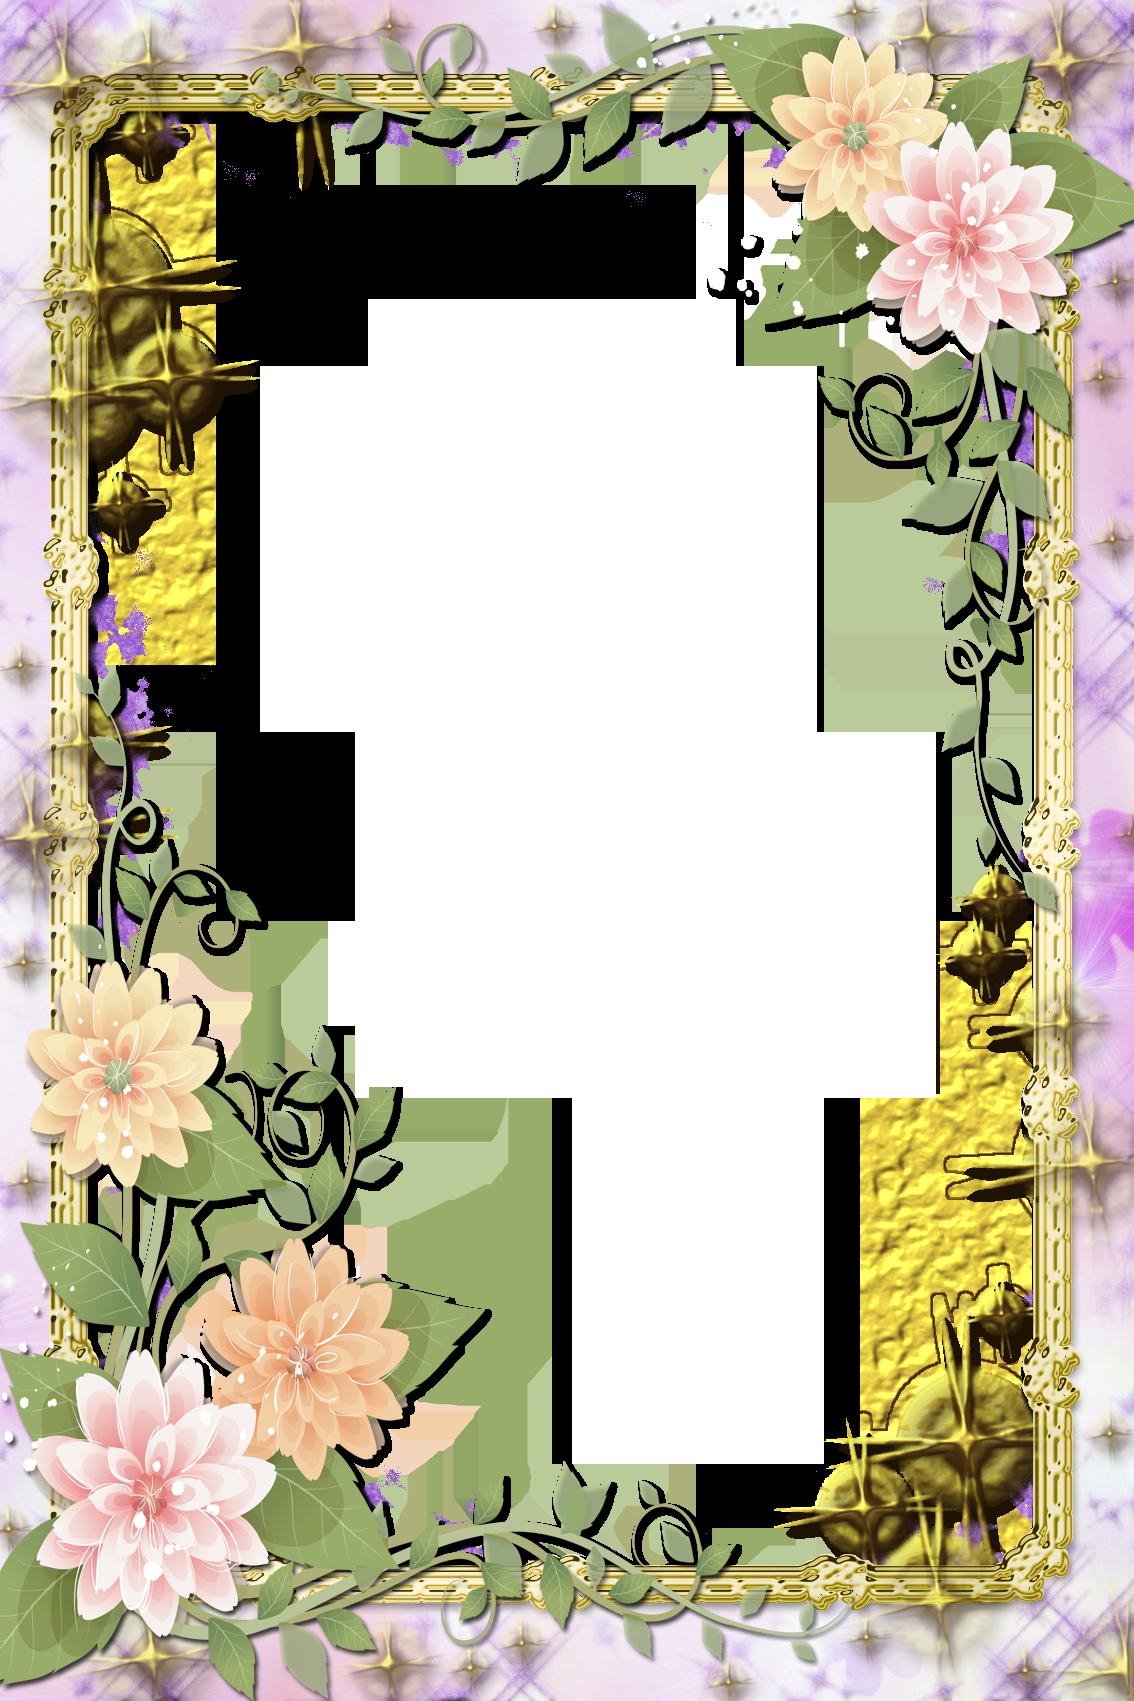 Transparent Flowers Frame Винтажные цветы, Цветочный, Цветы